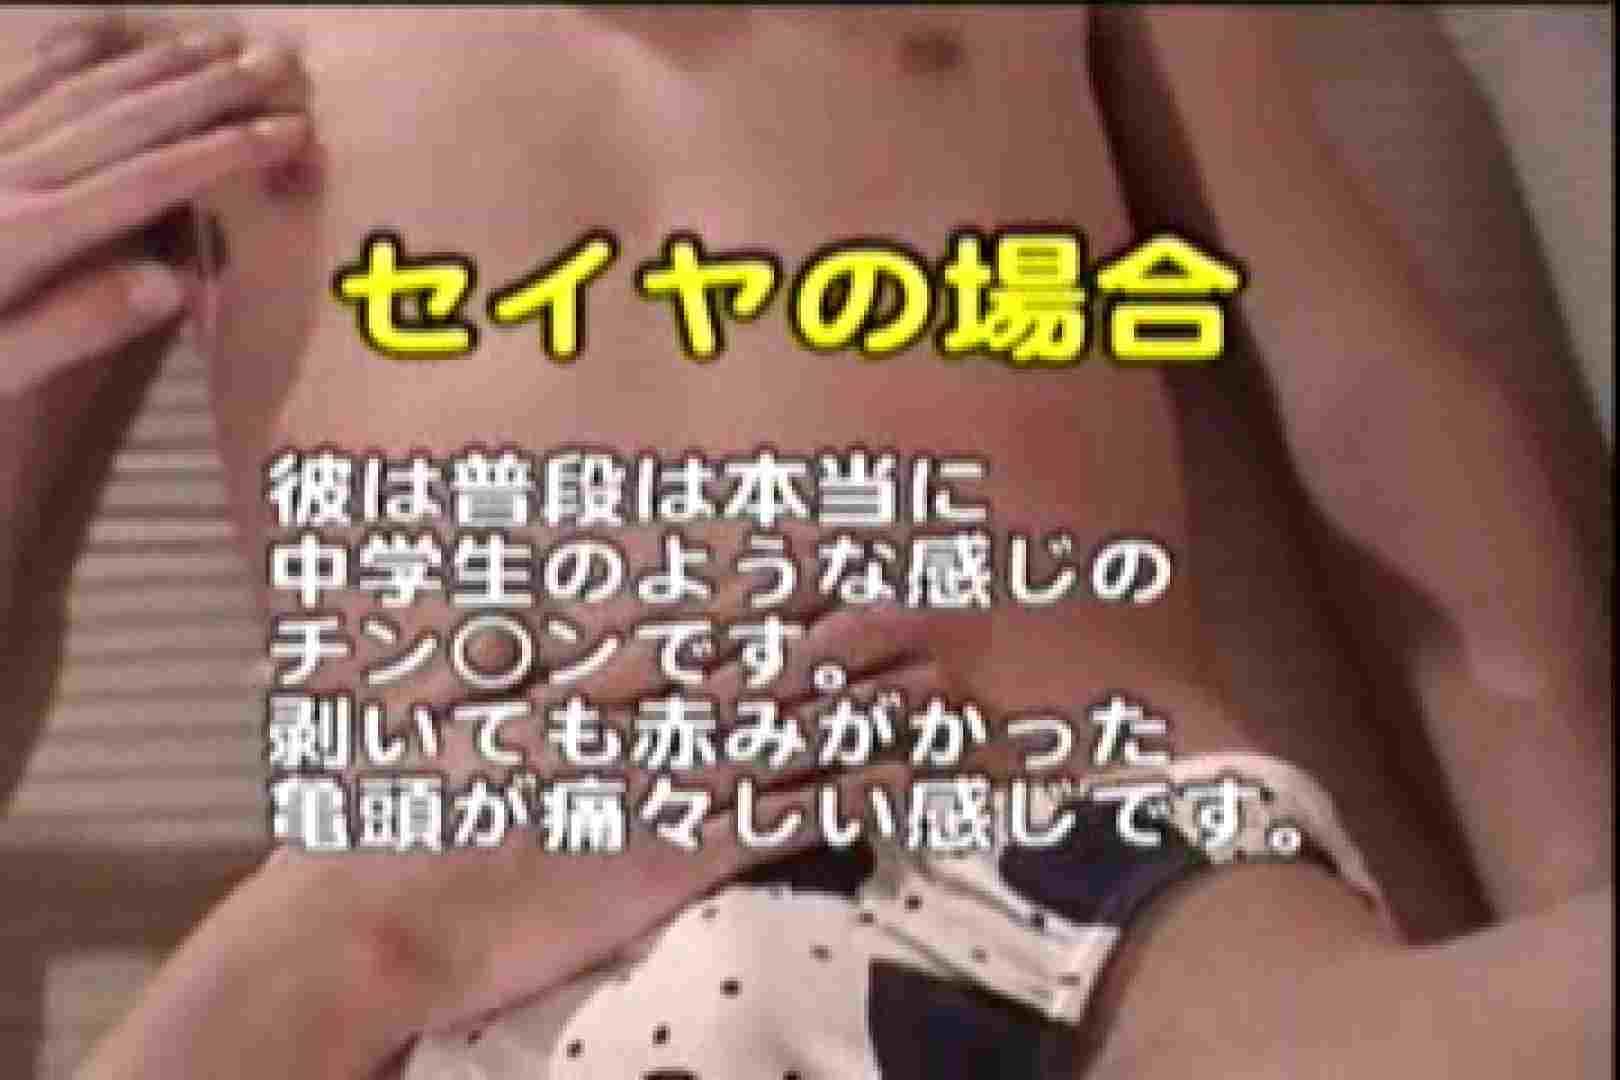 BABY FACEな包茎事情!!4FACEの快楽 射精男 ゲイ無料エロ画像 108画像 5